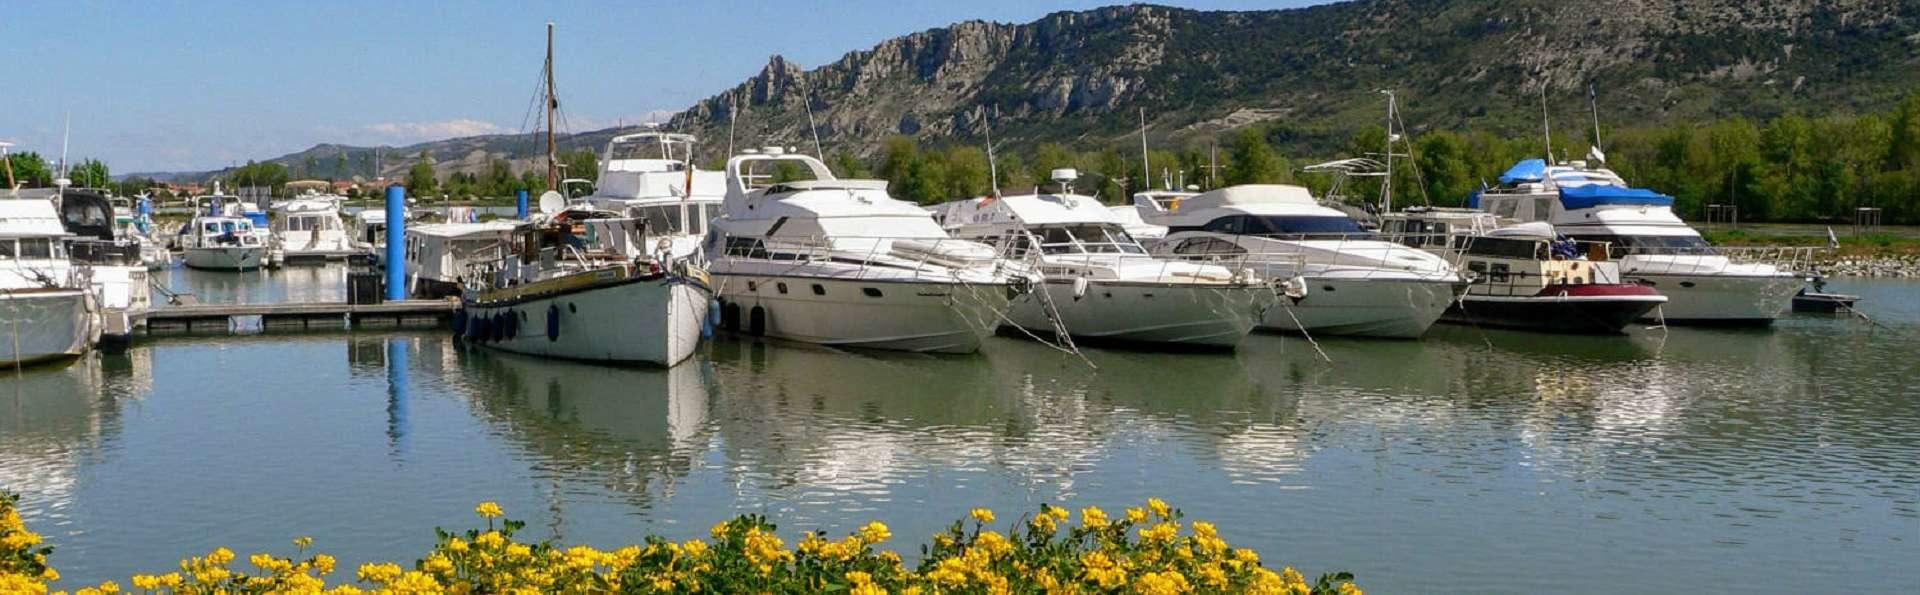 Maison Pic - EDIT_Valence_Port.jpg